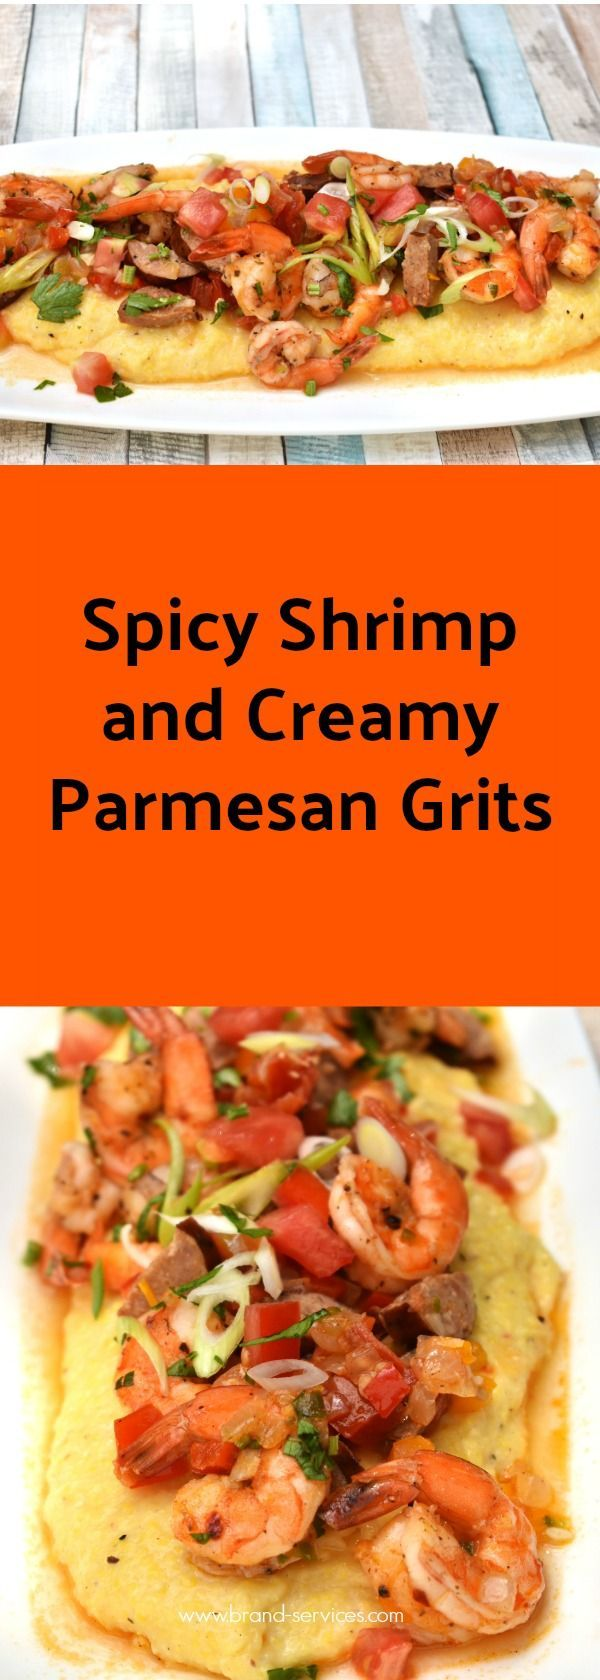 Best 25+ Shrimp n grits ideas on Pinterest | Shrimp grits ...